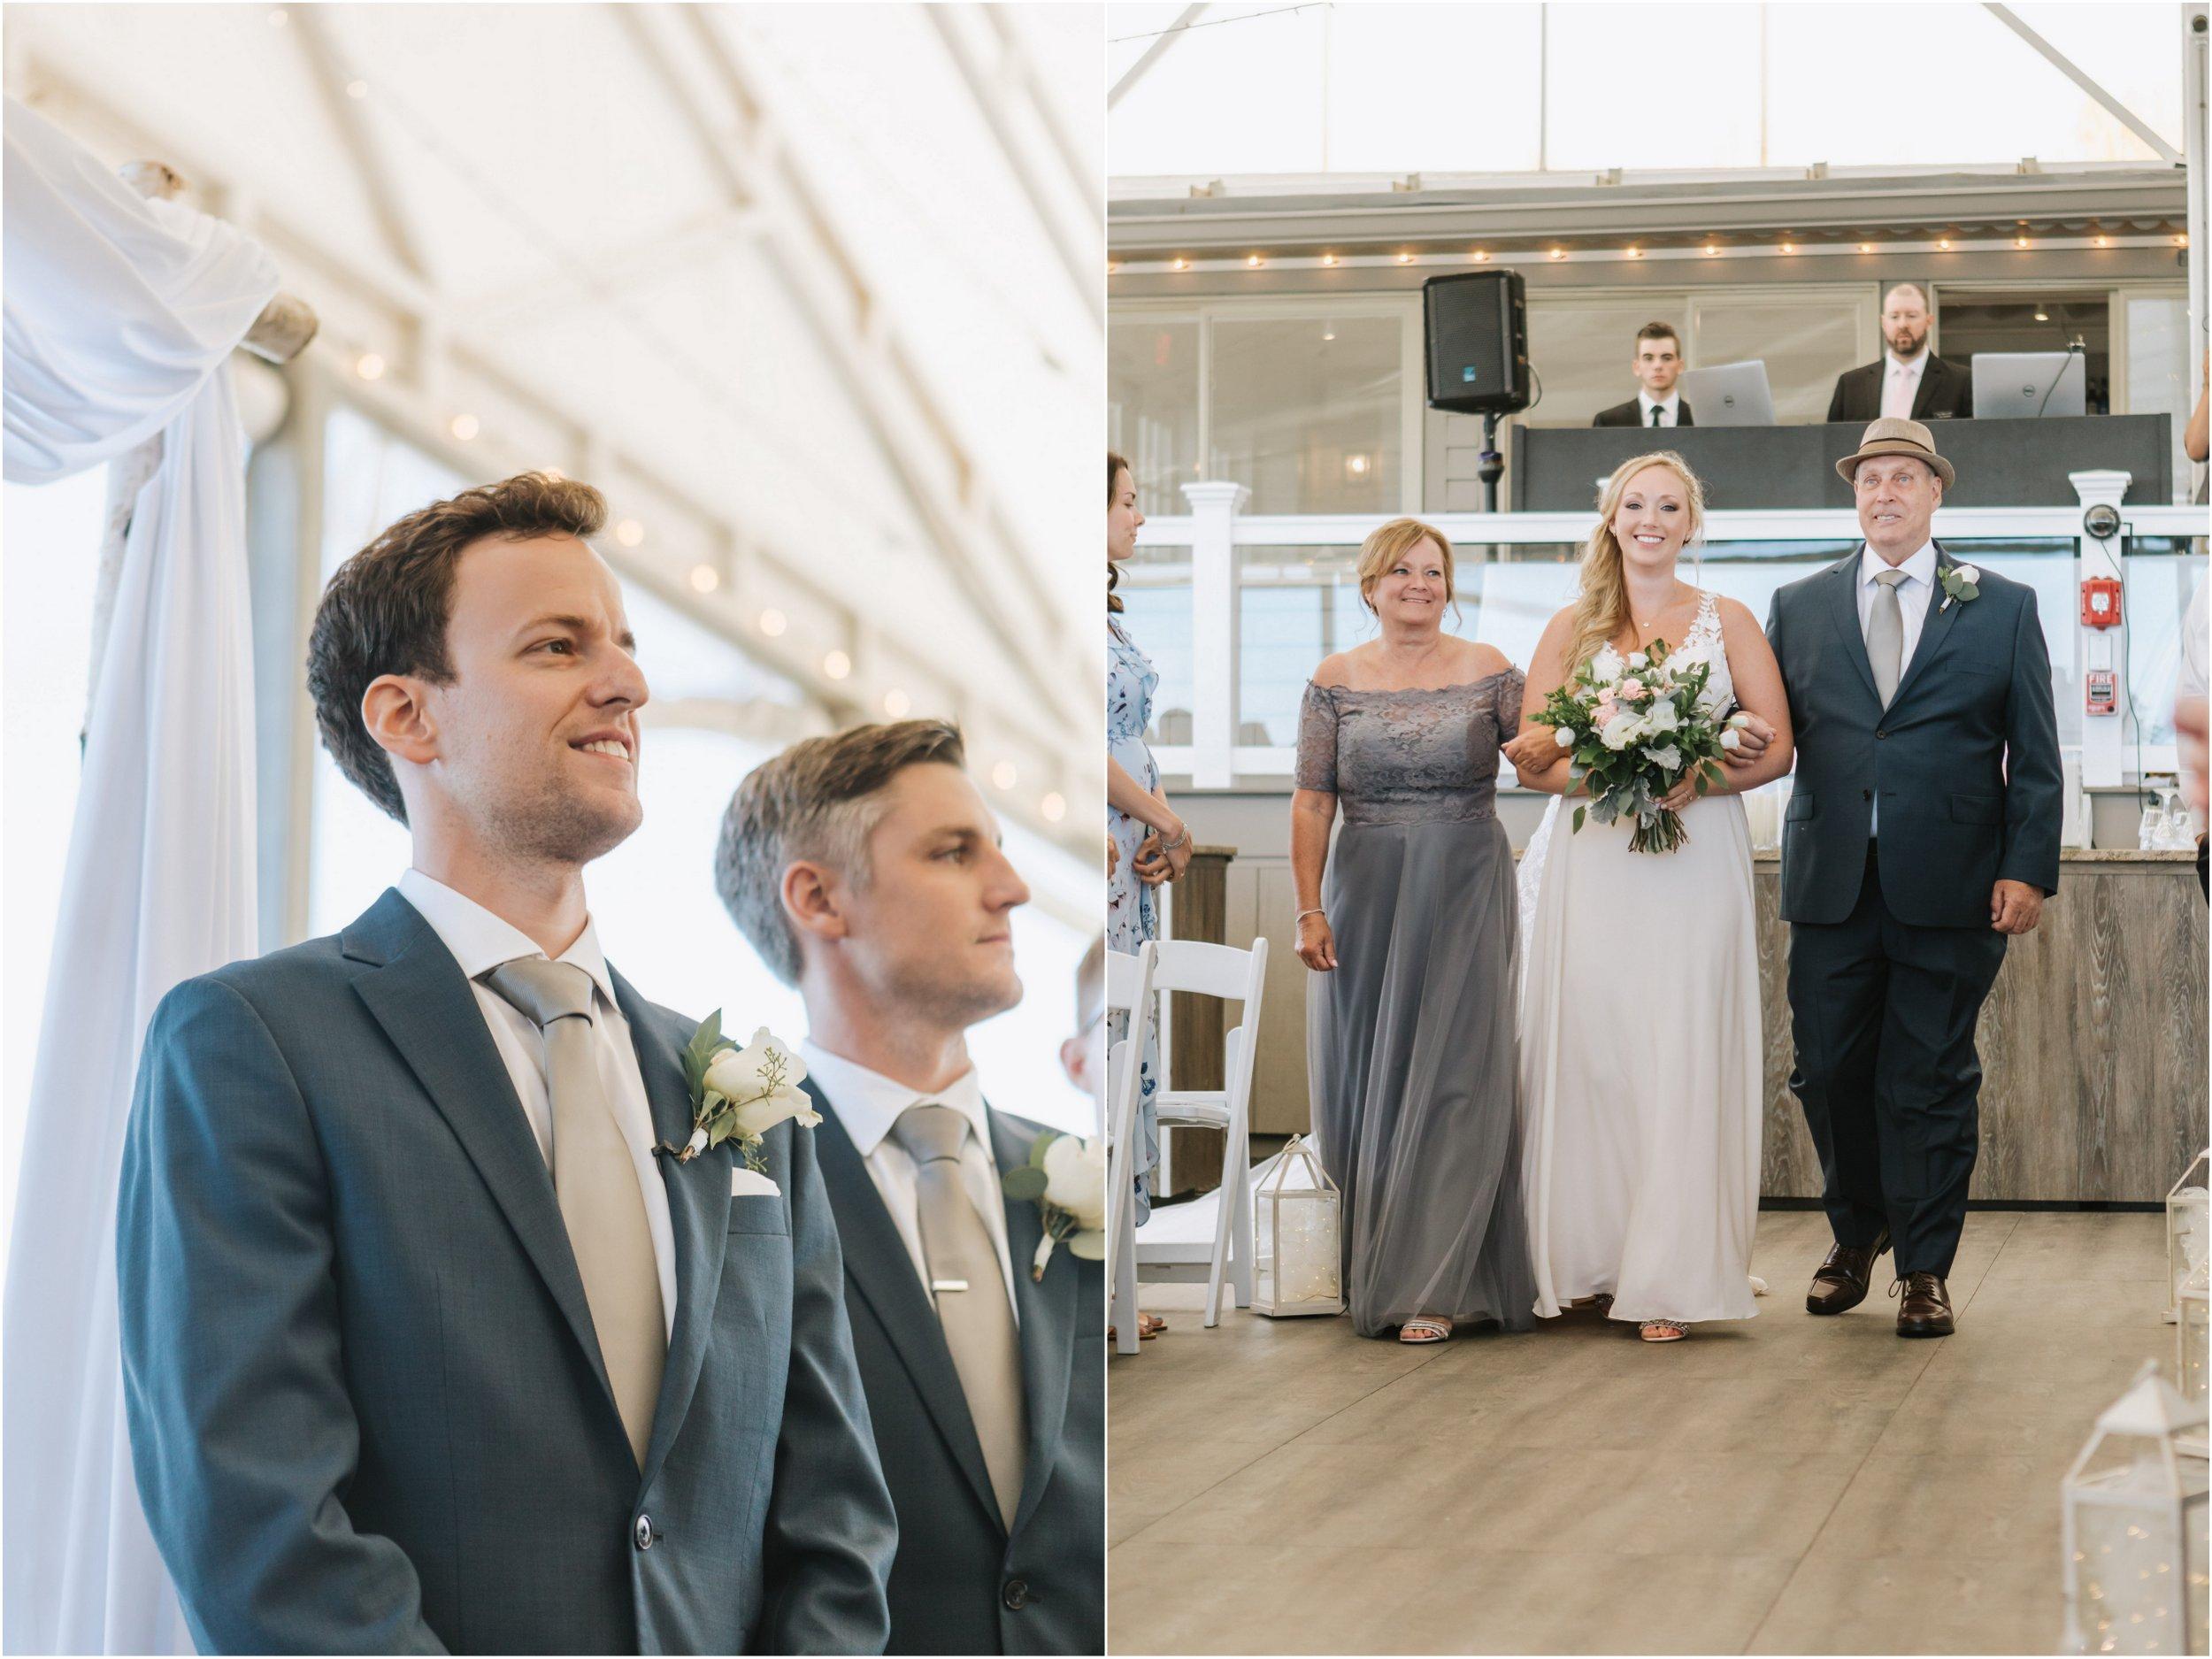 Popponesset-Inn-Wedding-Cape-Cod-Lena-Mirisola-Photography-31.jpg